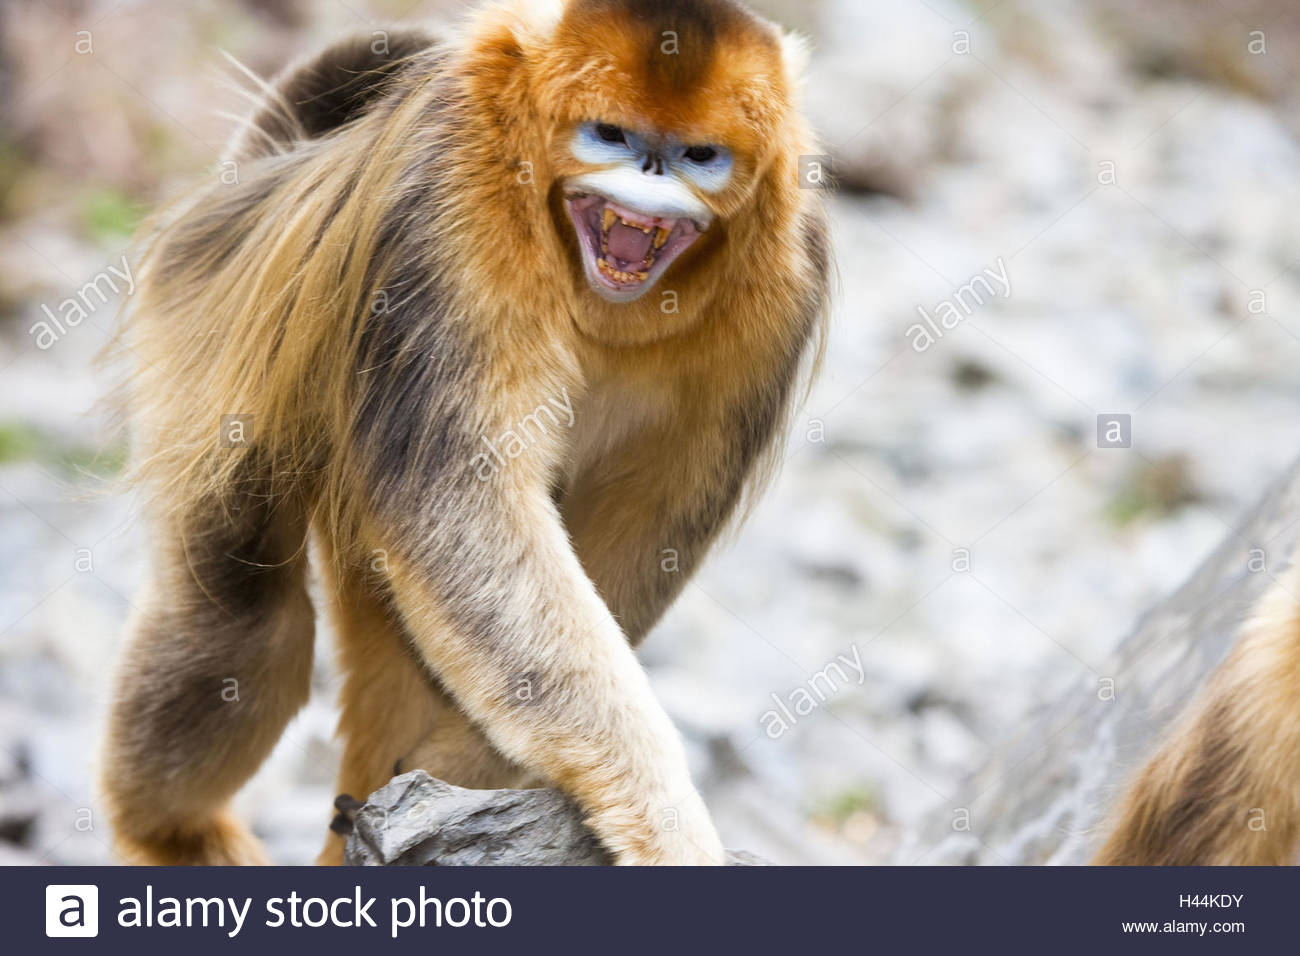 Monkeys, golden stump noses, Rhinopithecus roxellana, little men, shout, - Stock Image